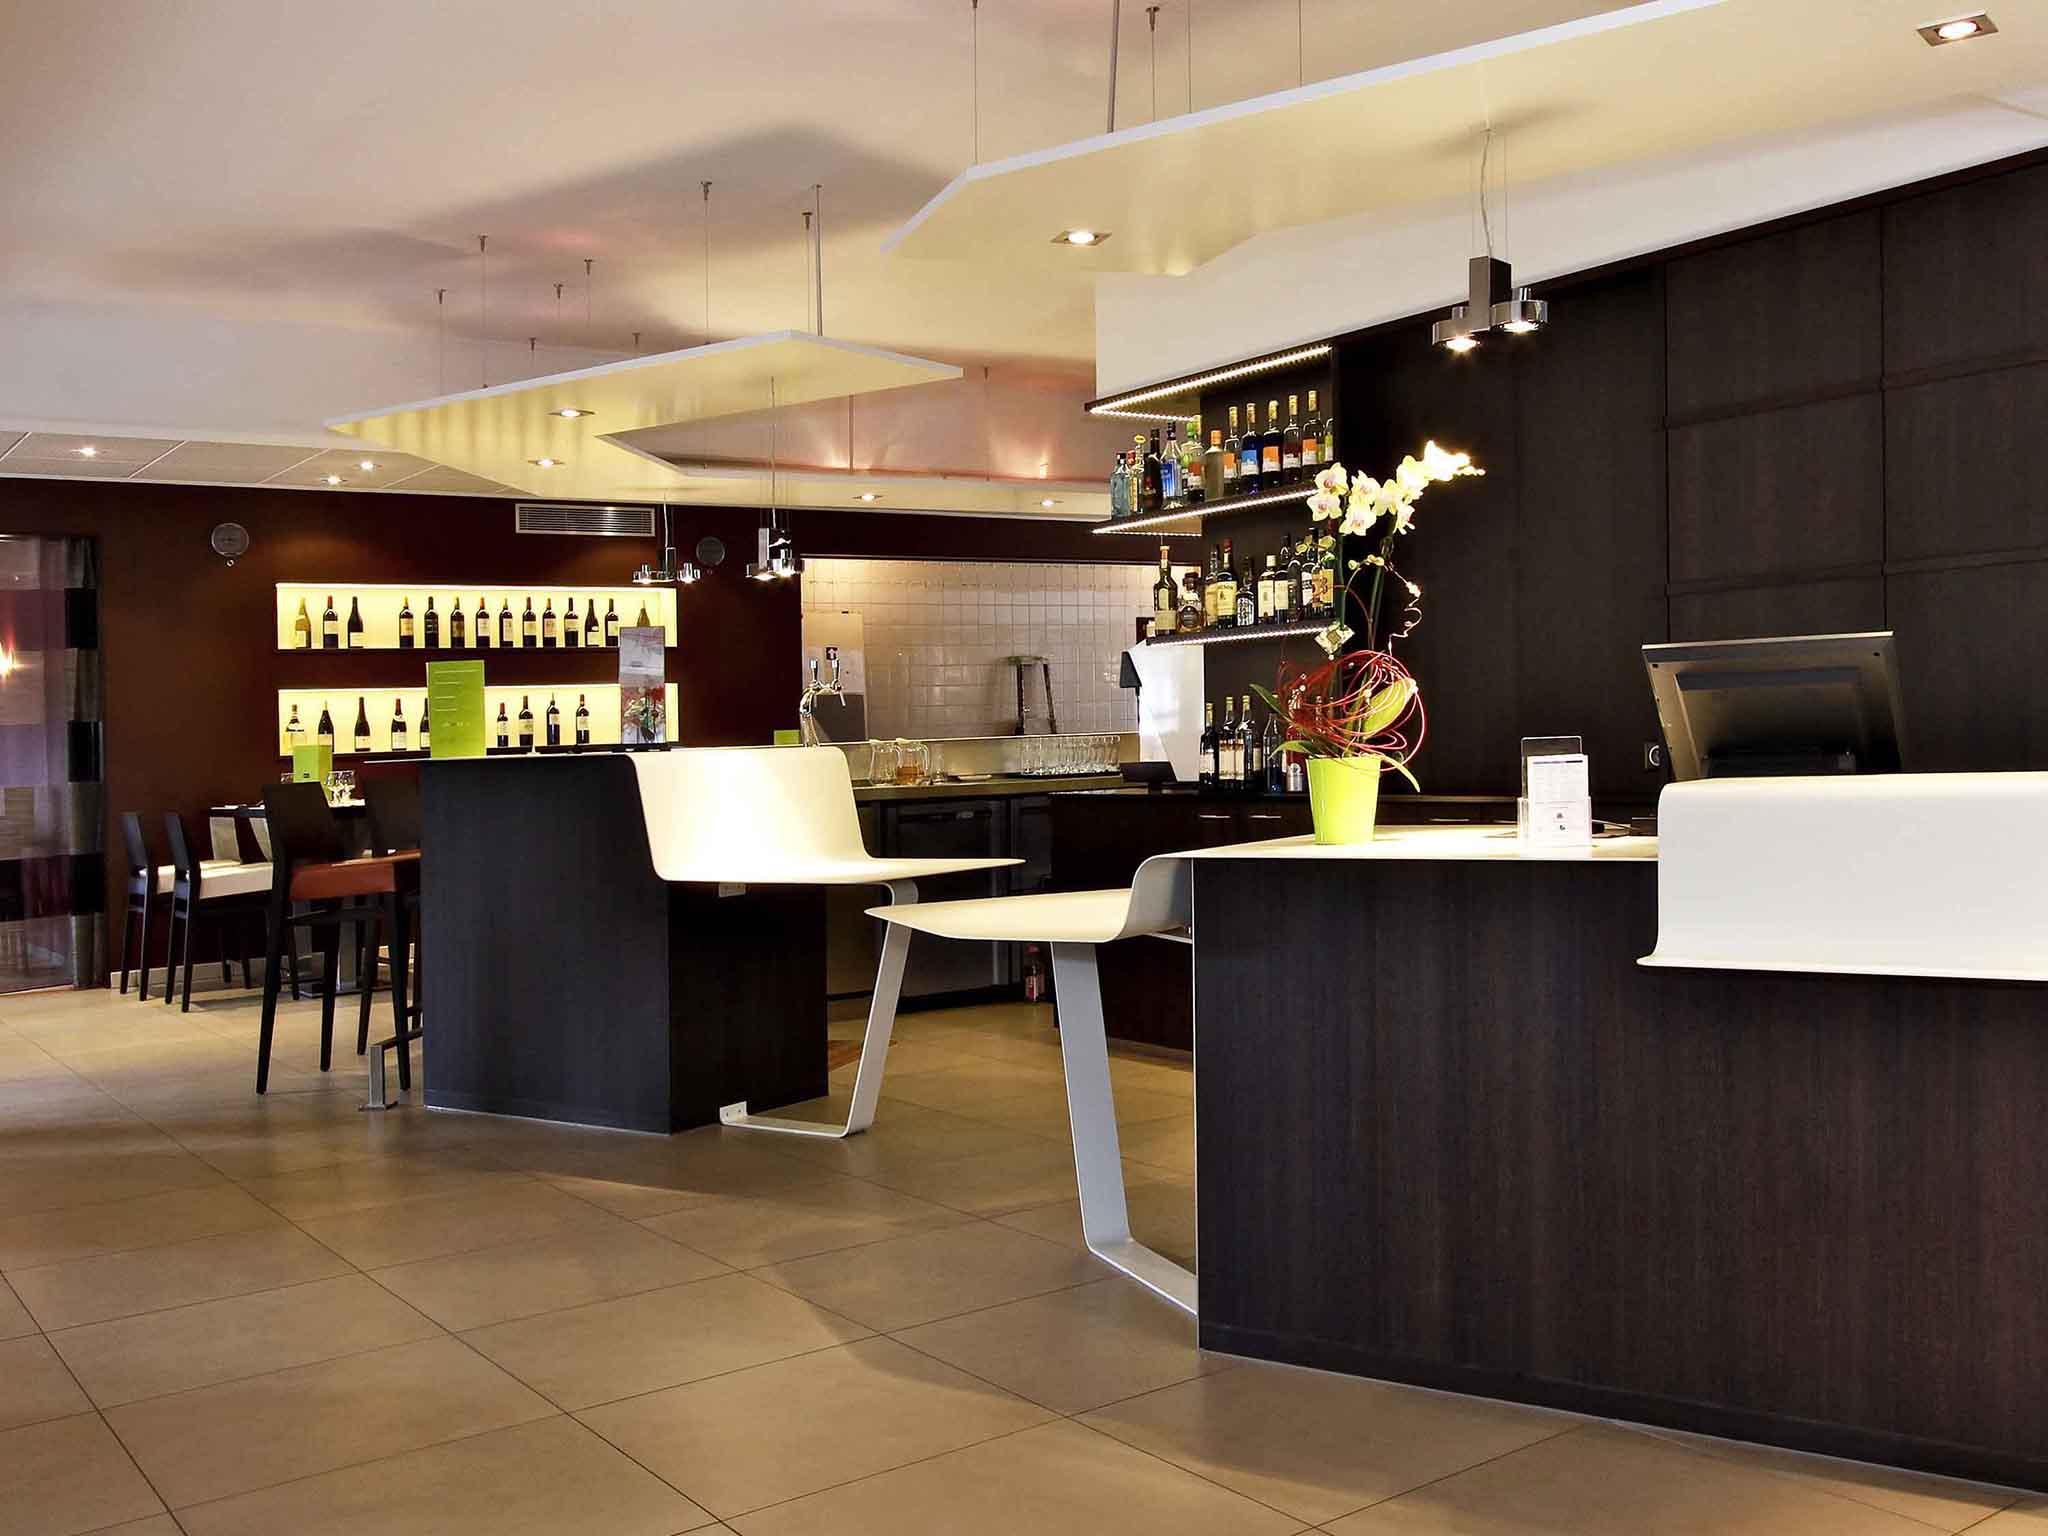 Hotel – Albergo Mercure Luxeuil Les Bains Hexagone